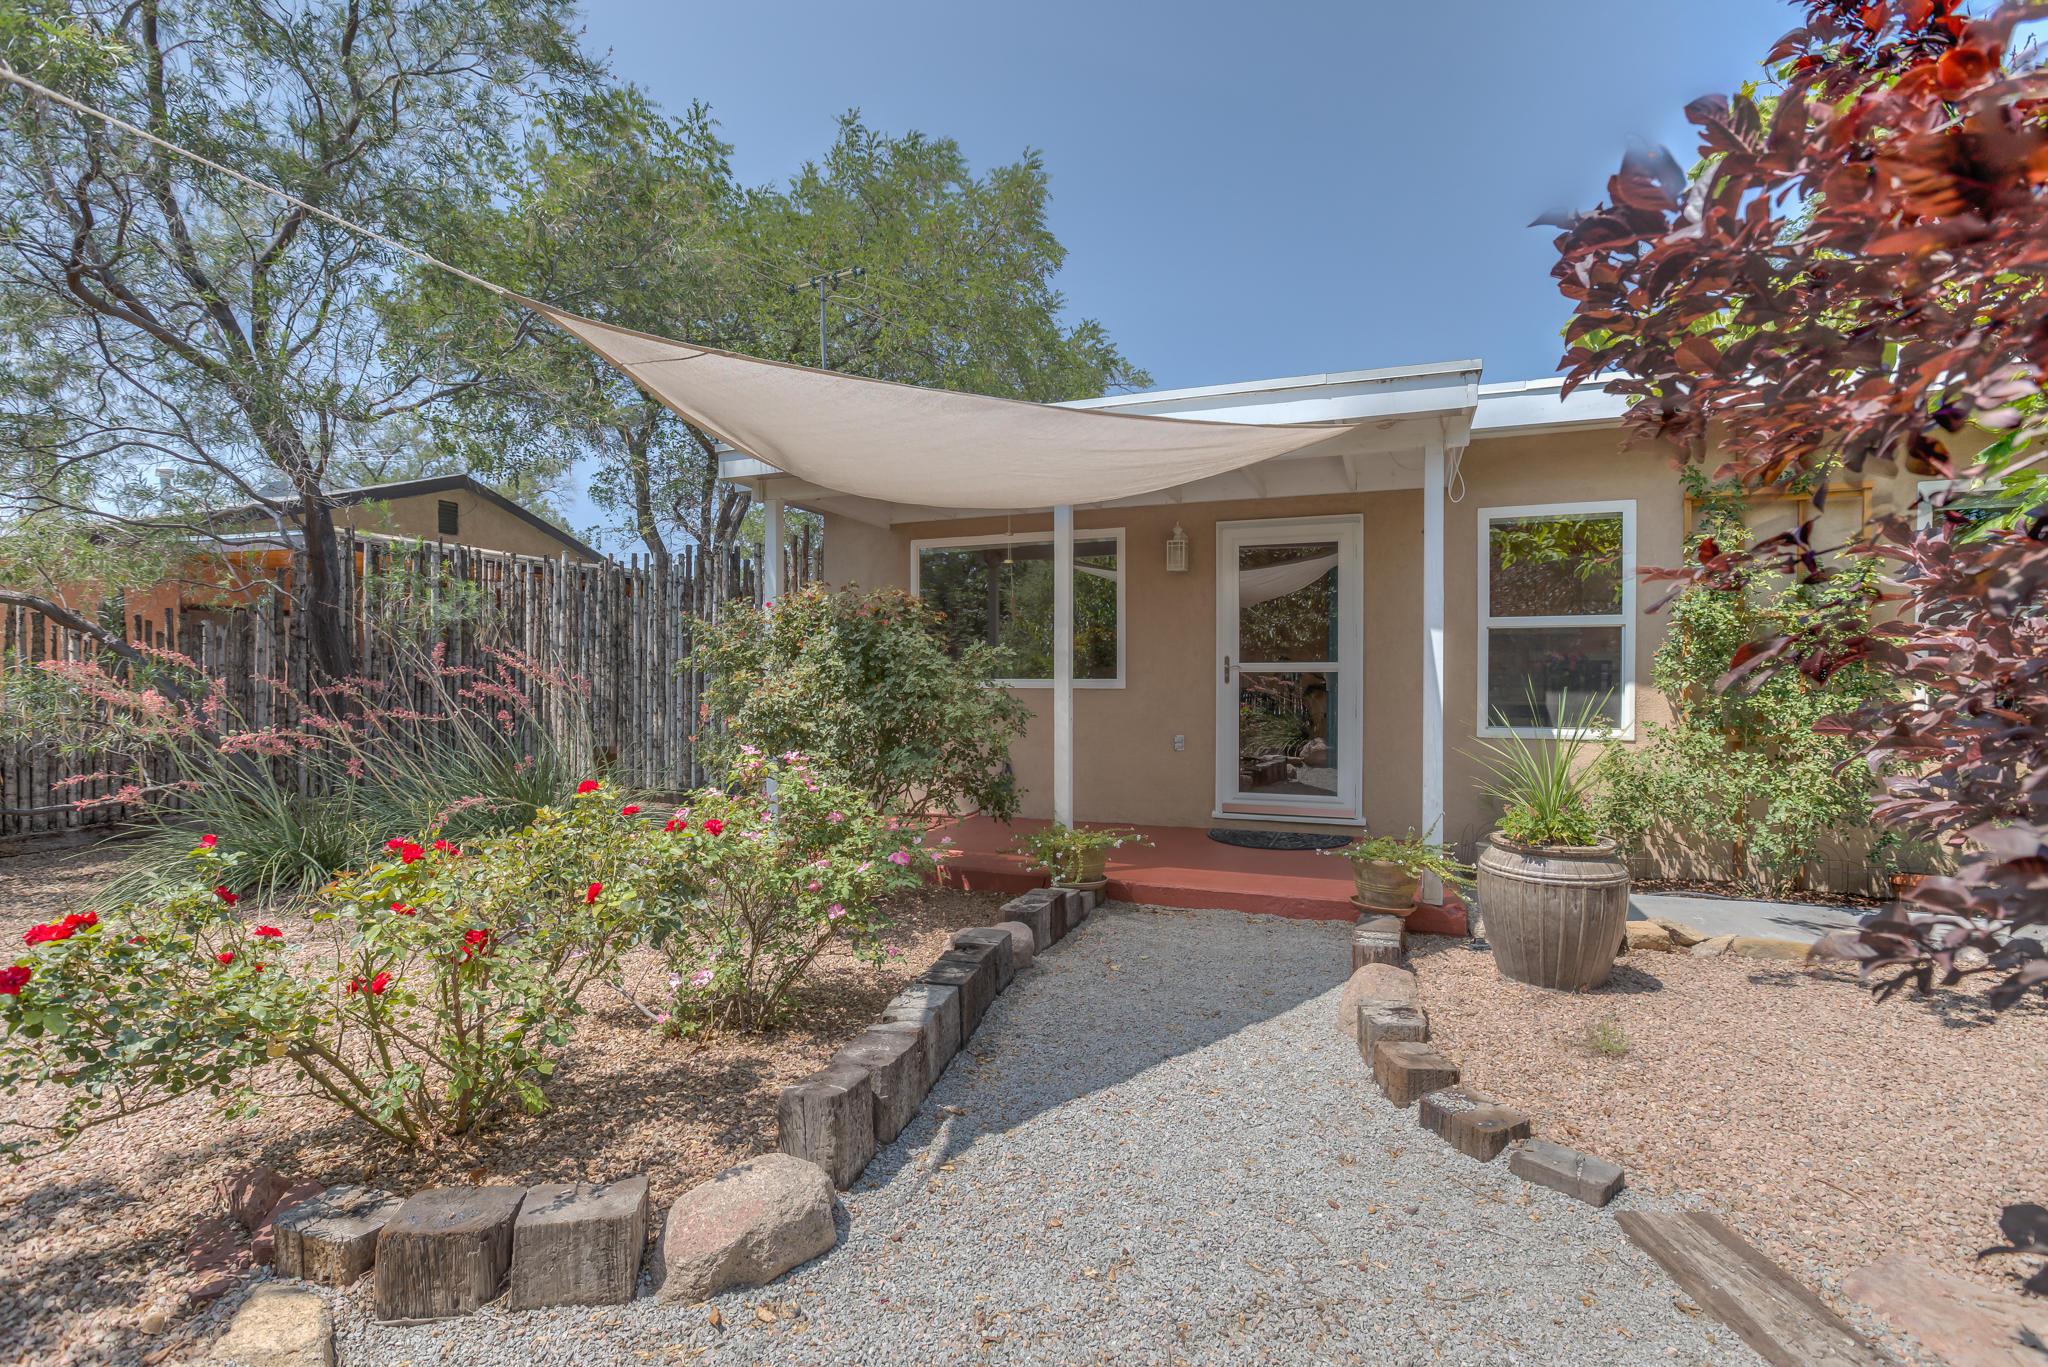 5013 San Luis,Albuquerque,New Mexico,United States 87107,3 Bedrooms Bedrooms,2 BathroomsBathrooms,Residential,San Luis,926362